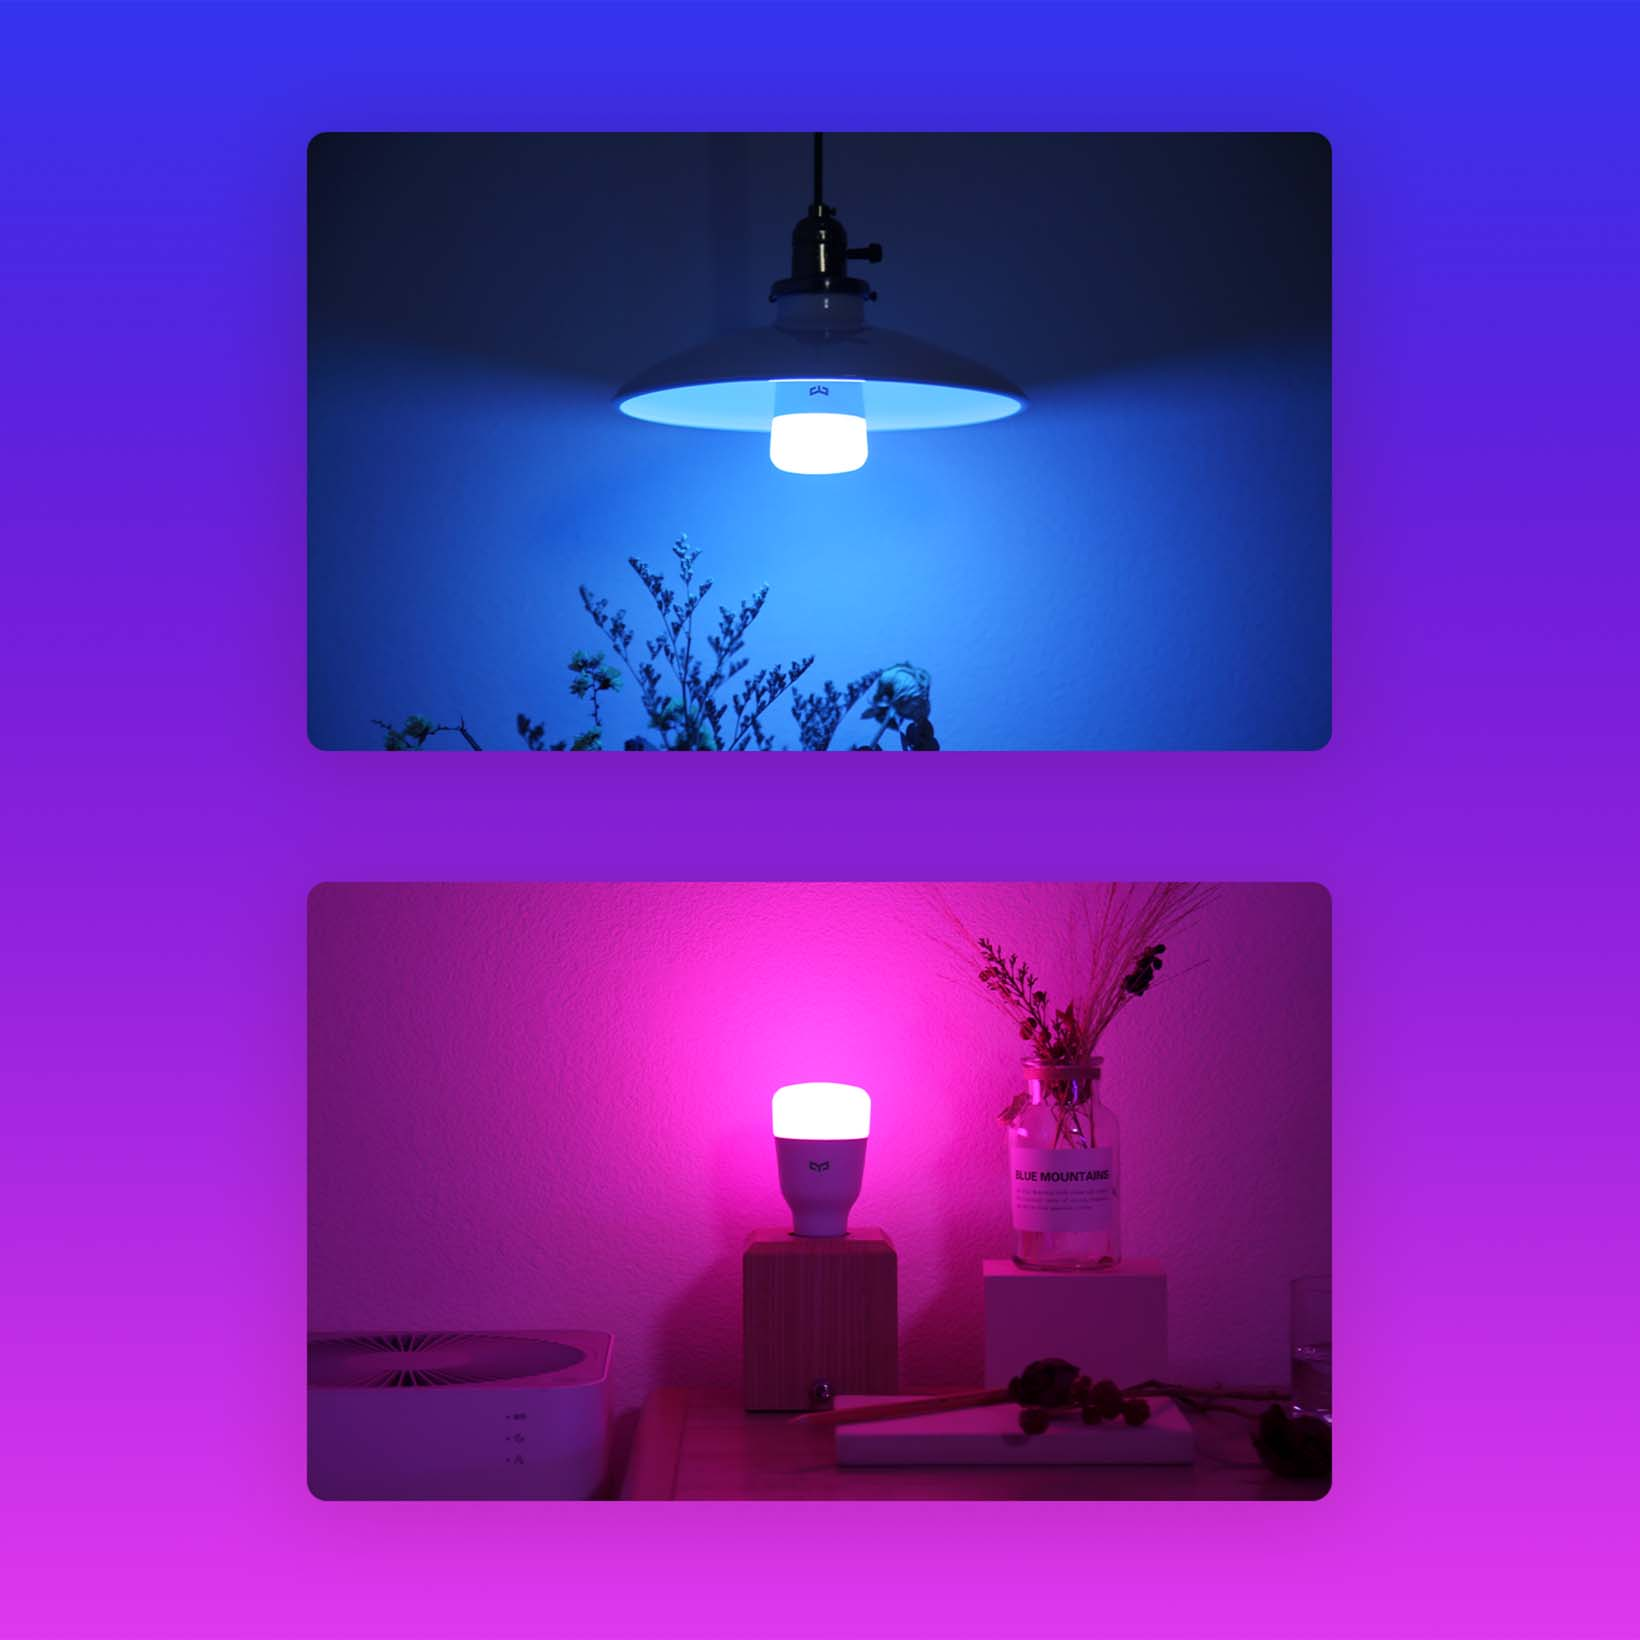 yeelight-color-bulb-1s-chance-color